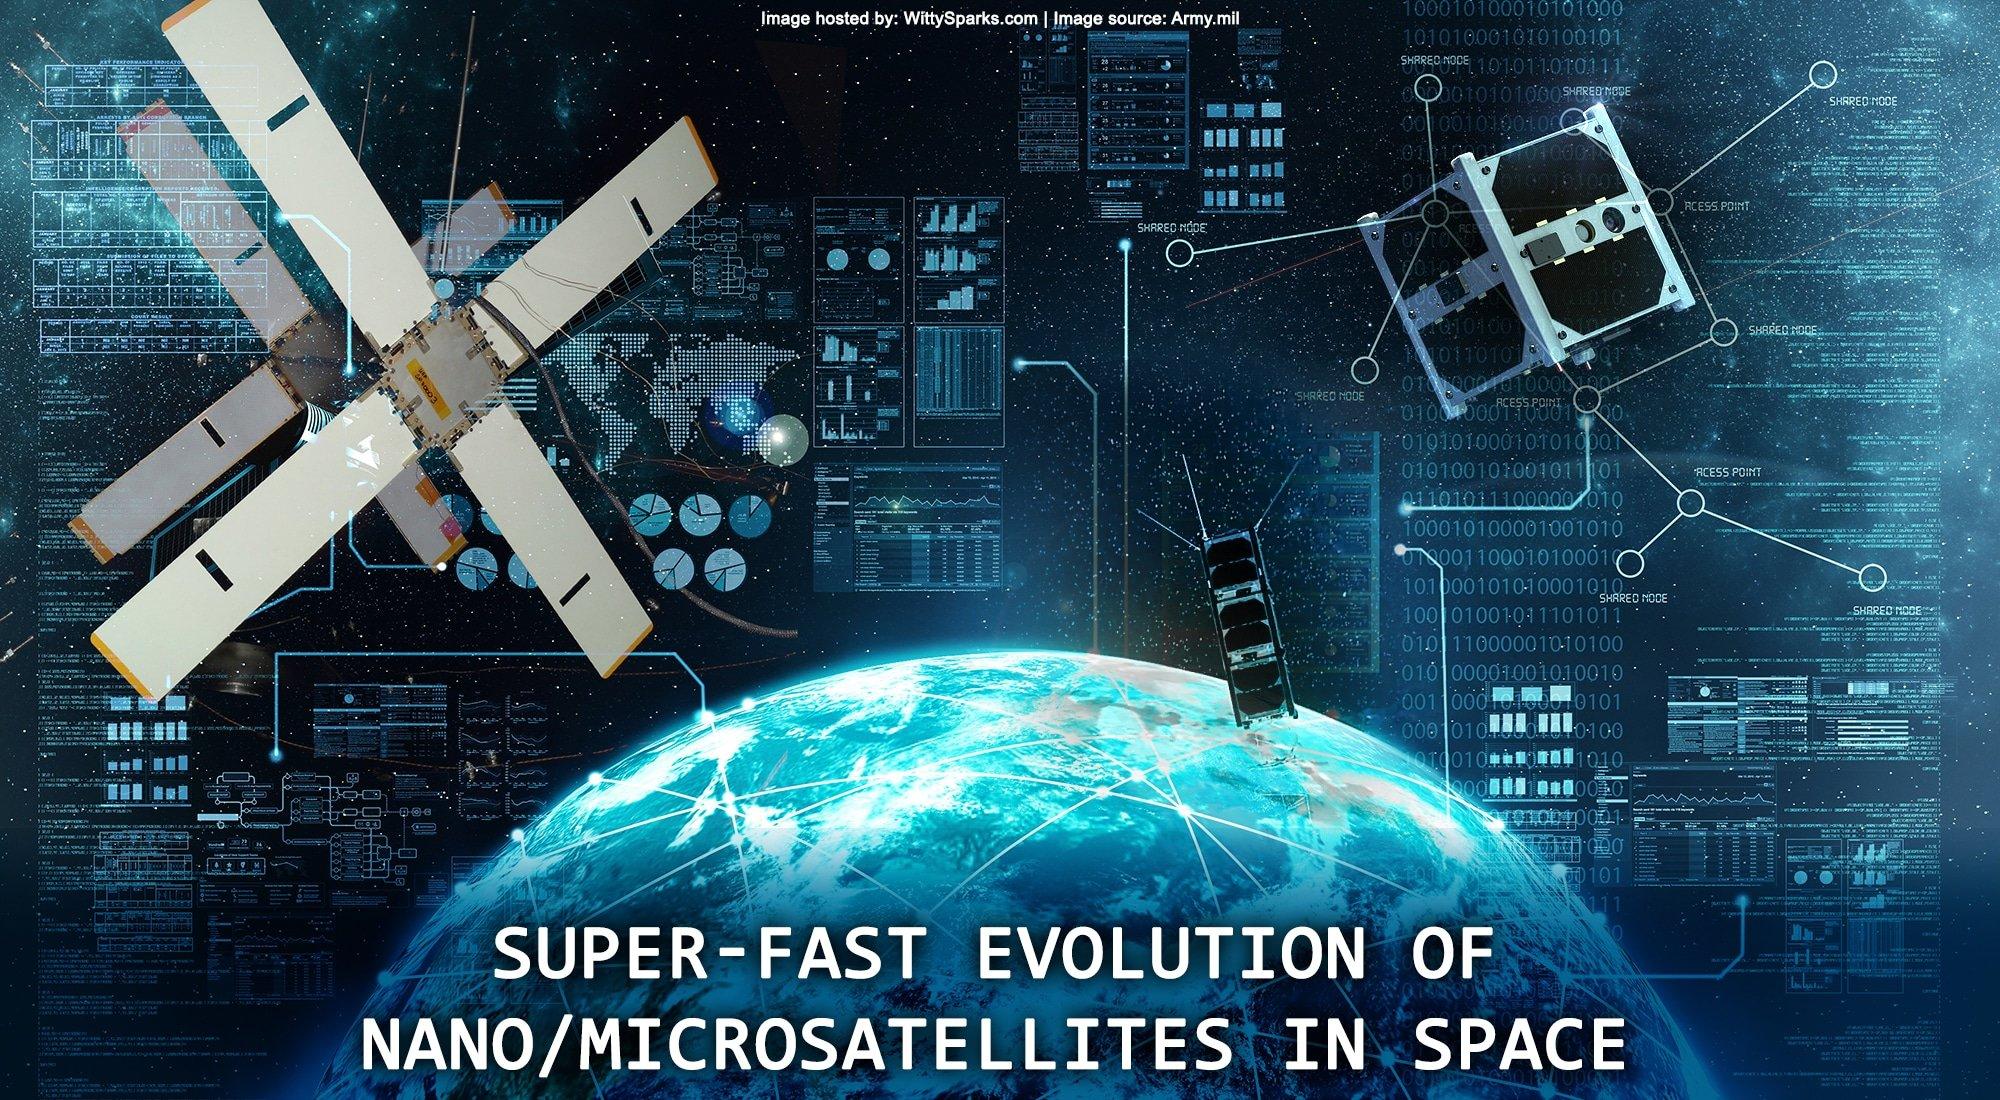 Super-fast Evolution of Nano/Microsatellites in Space